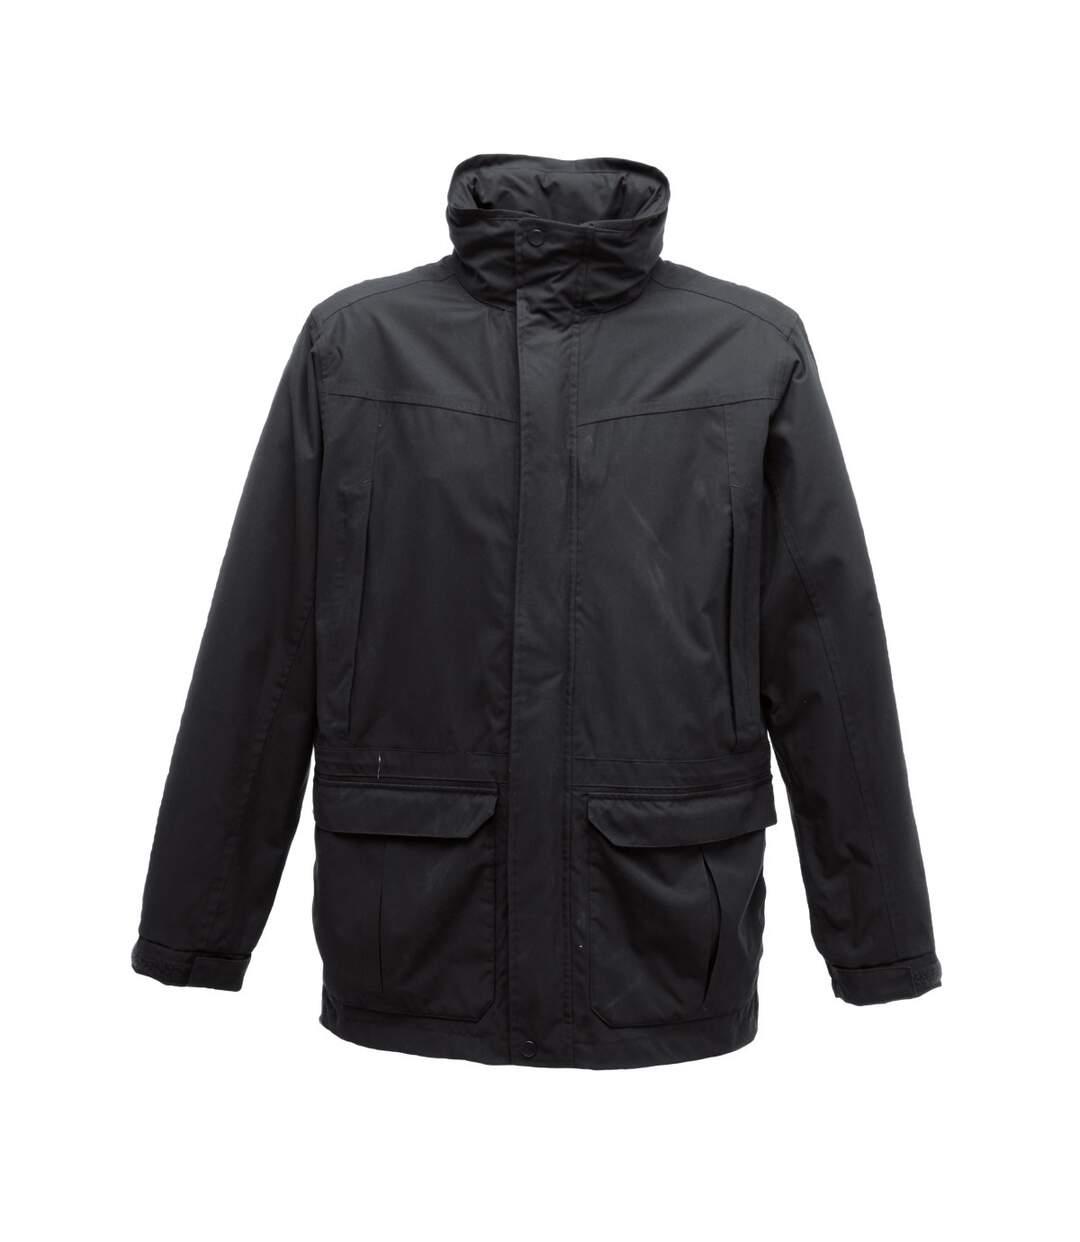 Regatta Mens Vertex III Waterproof Breathable Jacket (Black) - UTRG1608